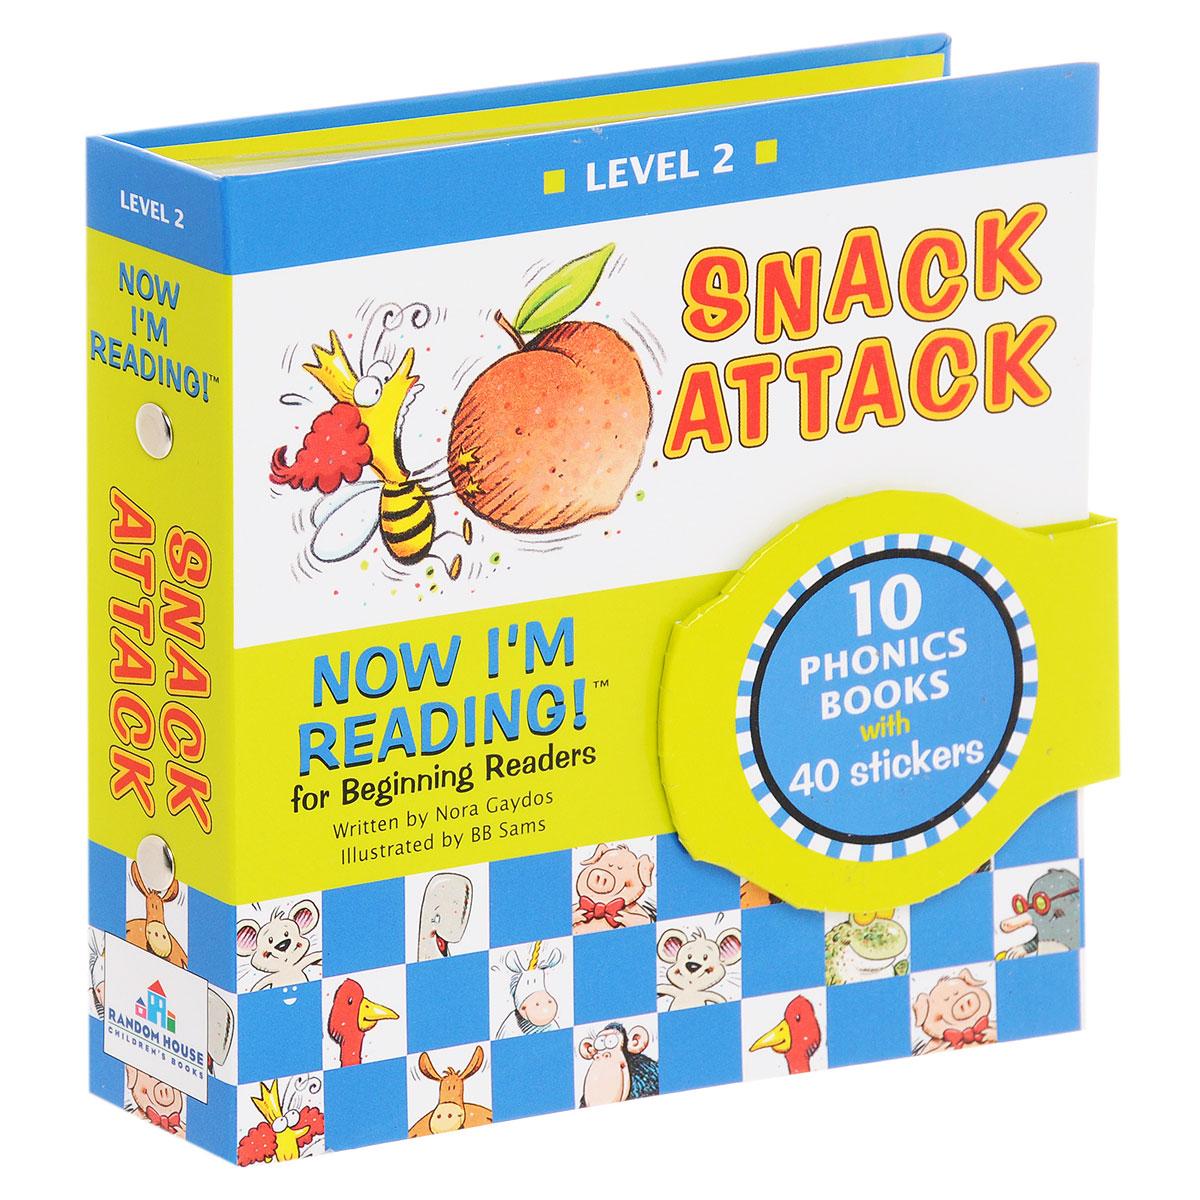 Now I'm Reading! Level 2: Snack Attack (комплект из 10 книг + наклейки)